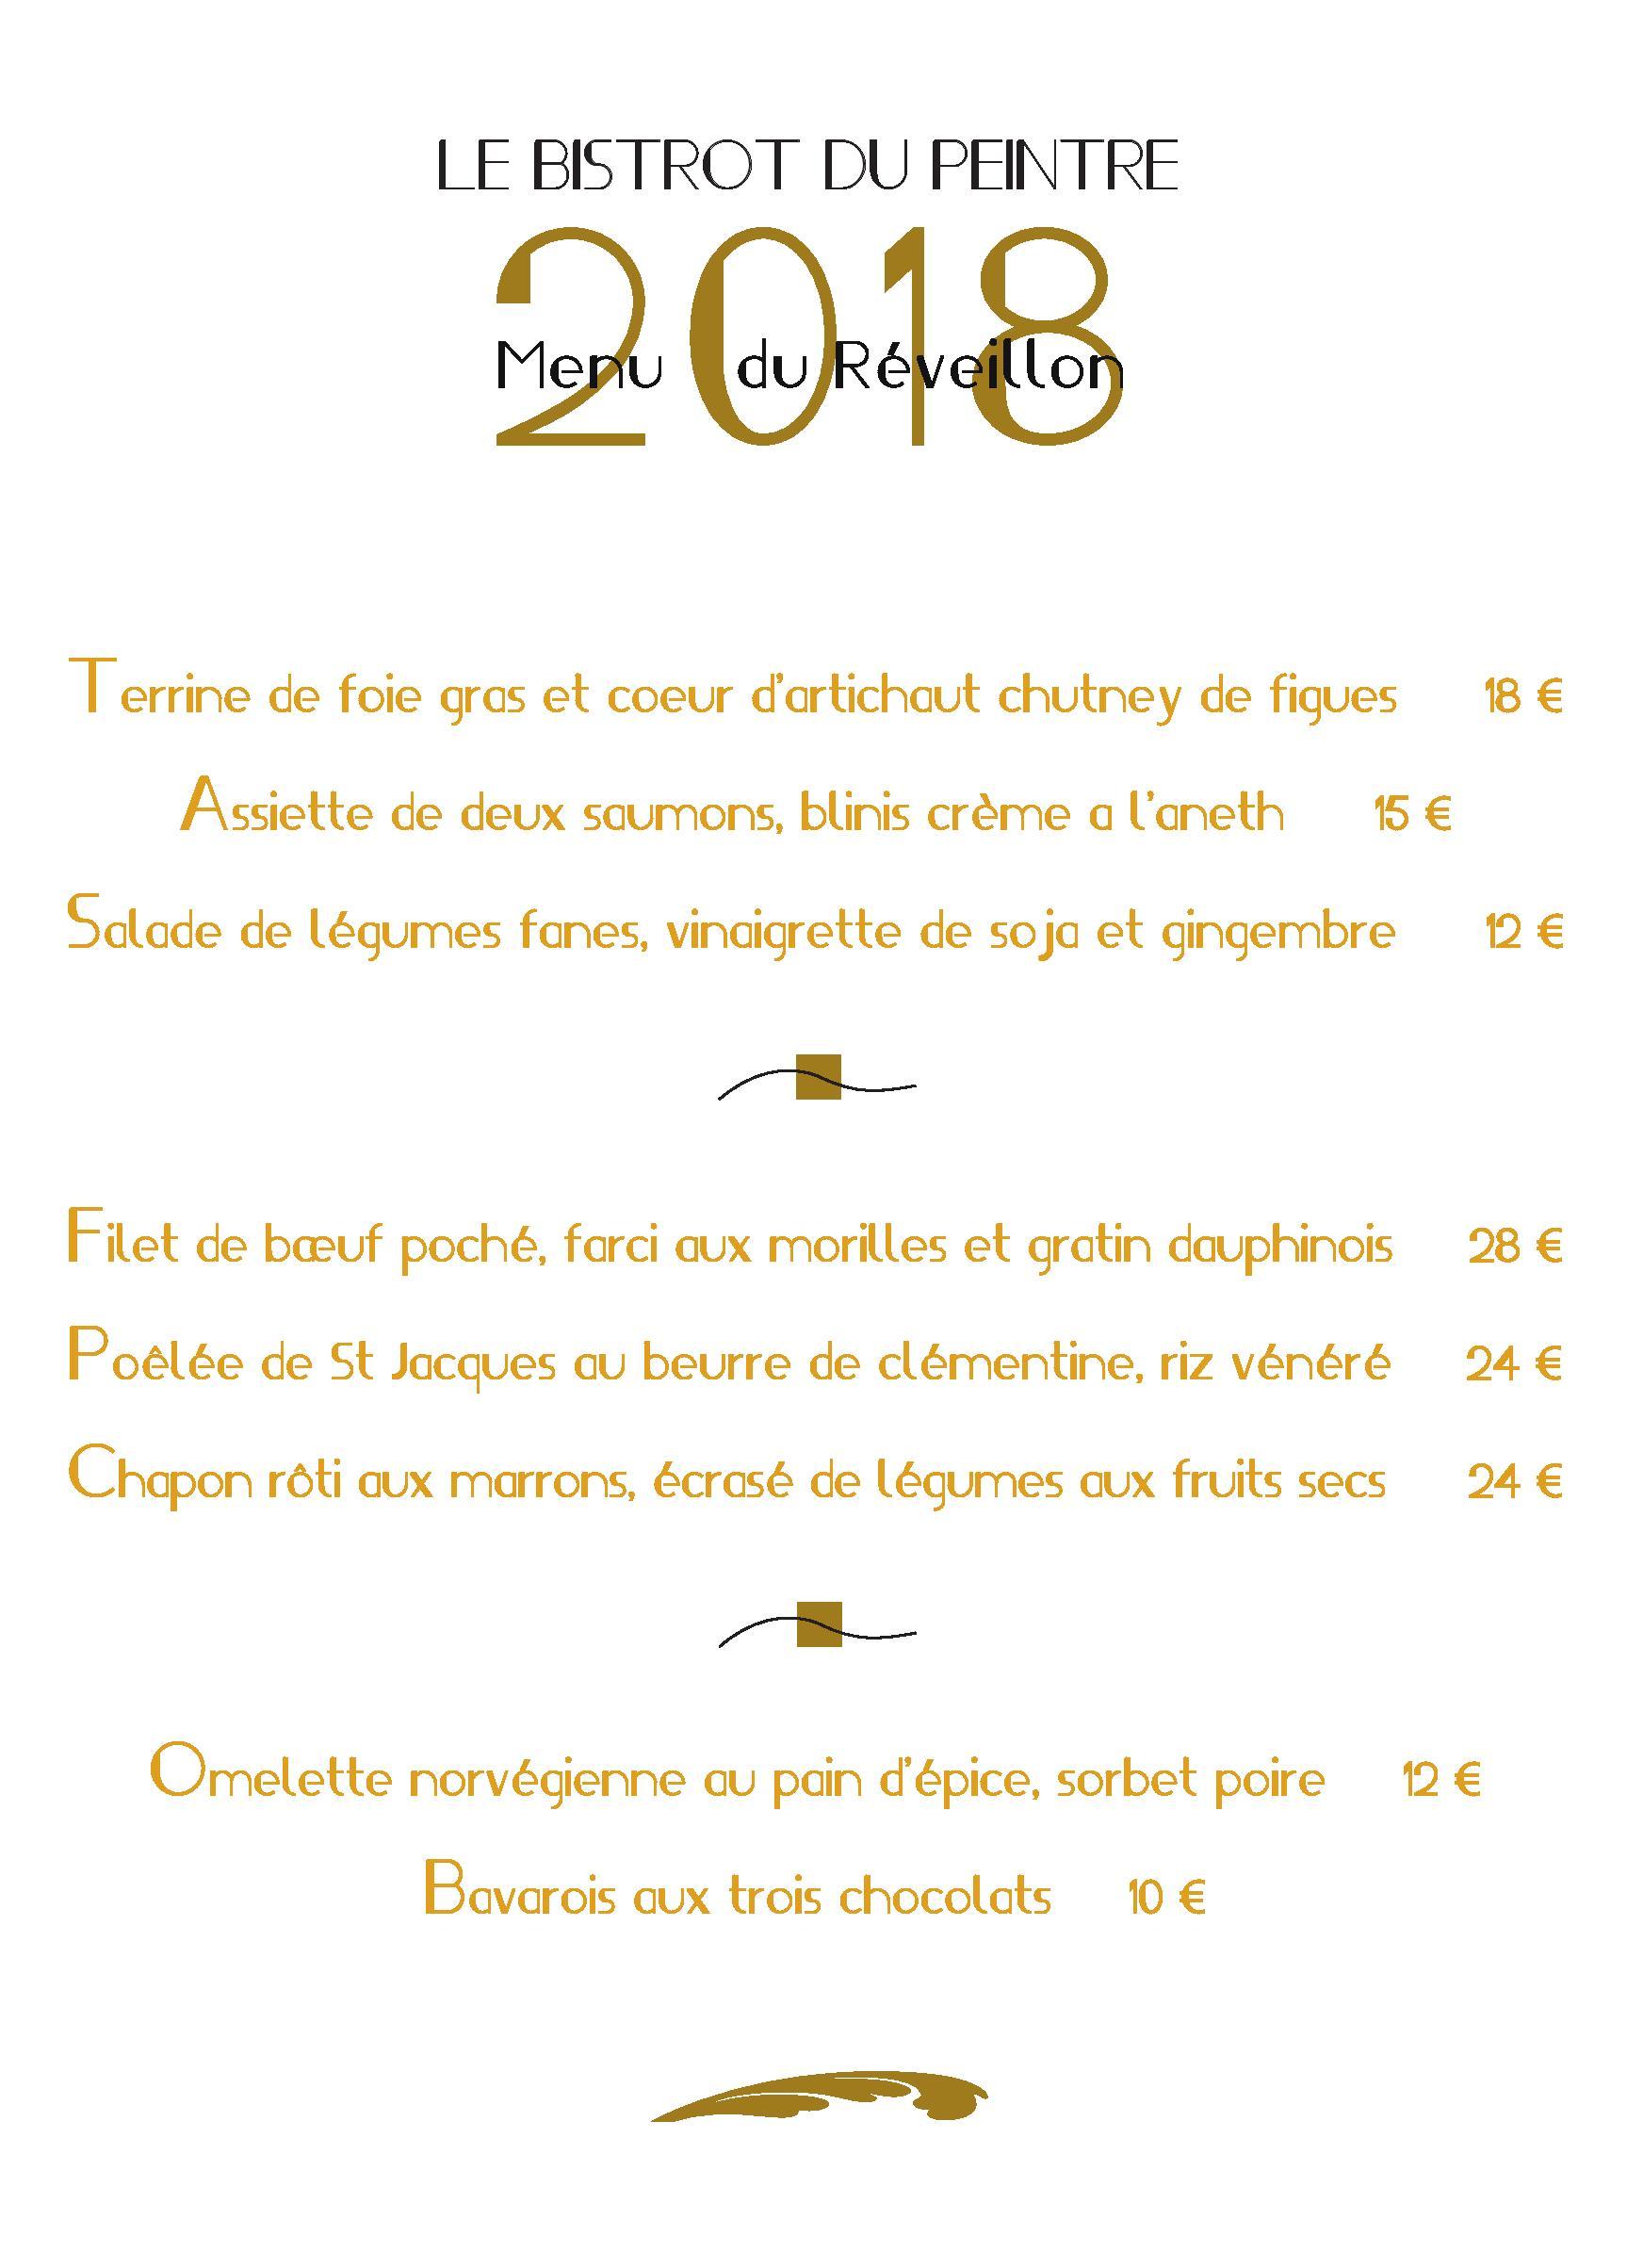 Bon-plan-restaurant-Bistrot-du-peintre-elisa-les-bons-tuyaux-15.jpg